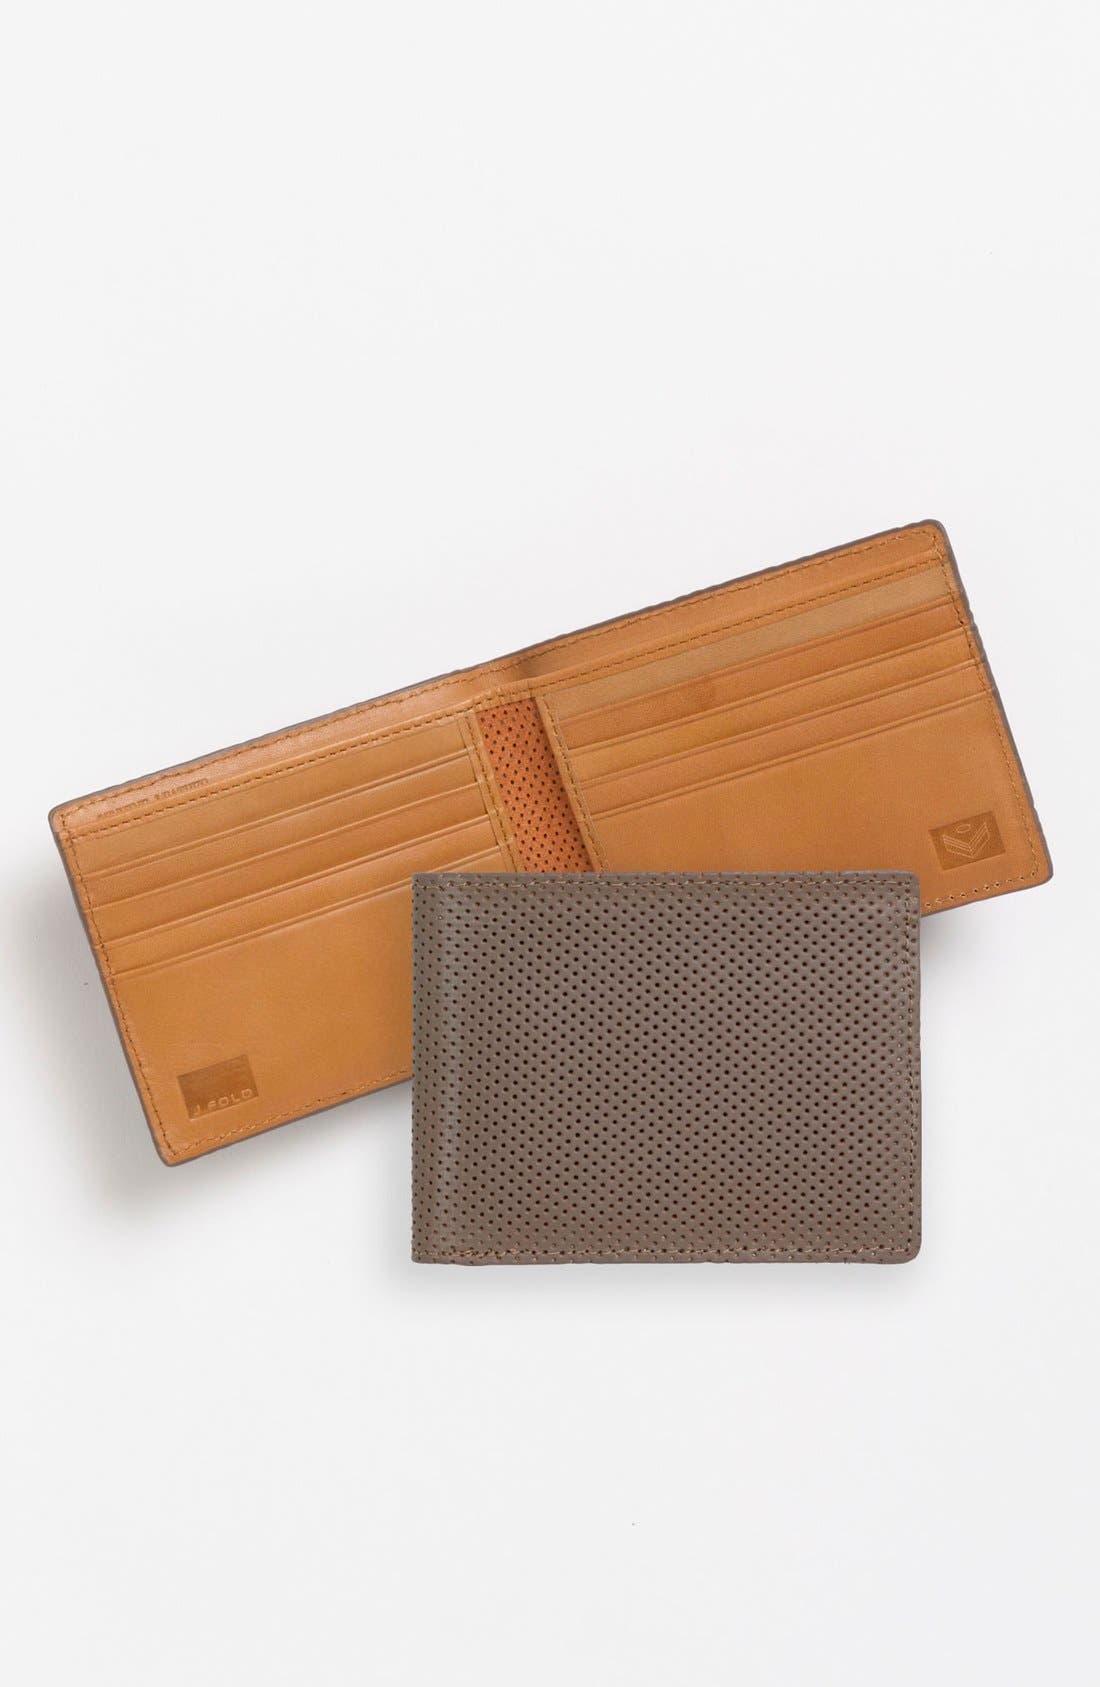 Alternate Image 1 Selected - J Fold 'Microperf' Slimfold Wallet